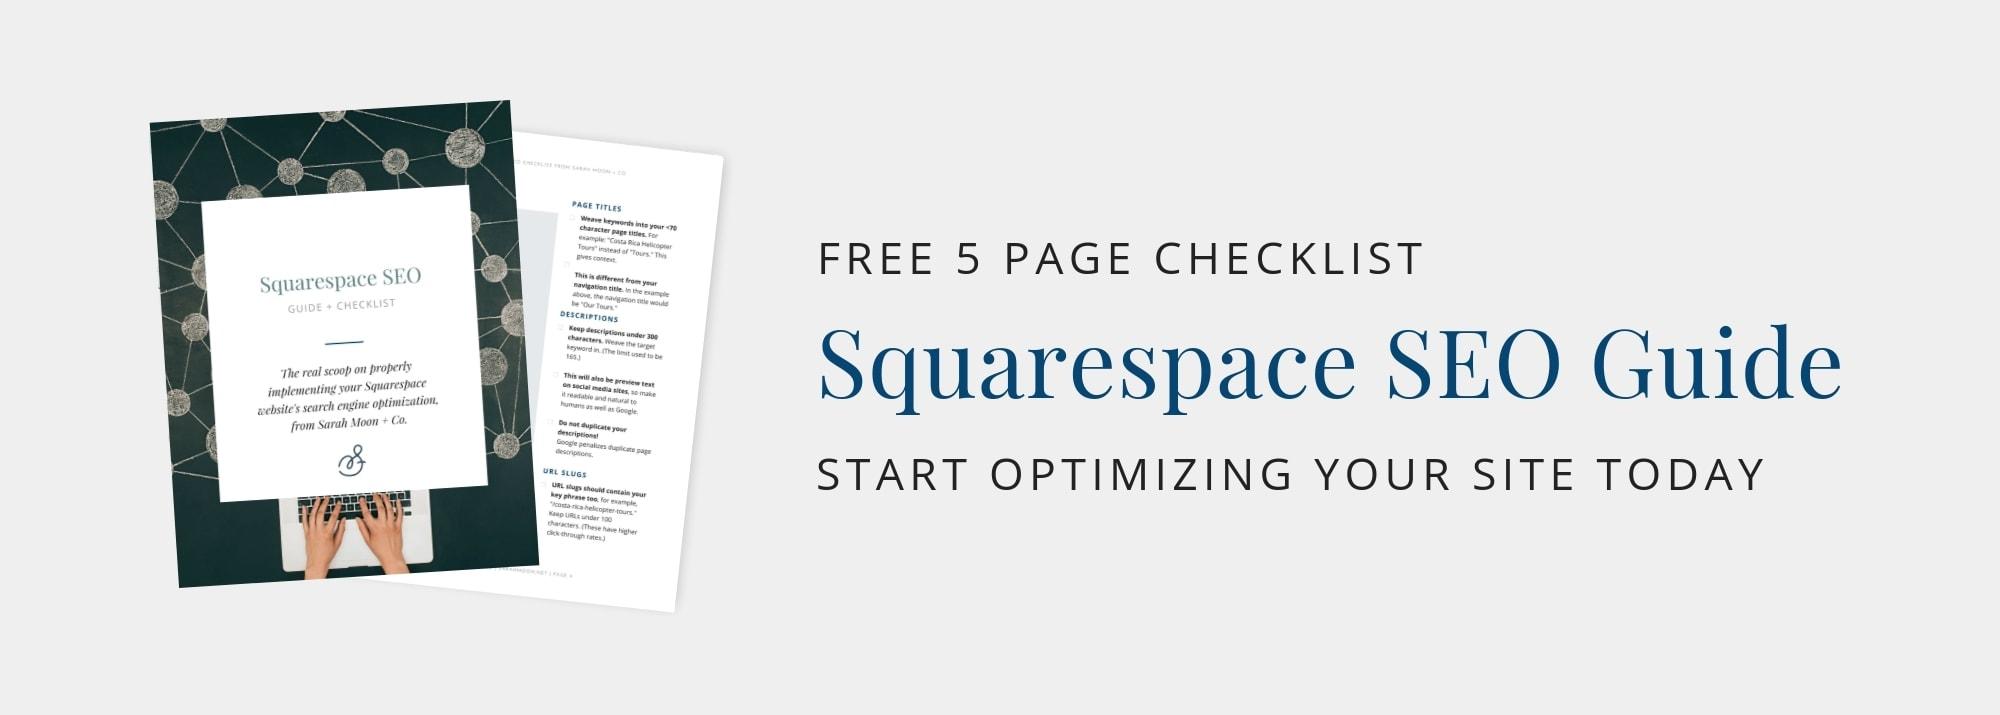 Get Your Squarespace SEO Checklist!